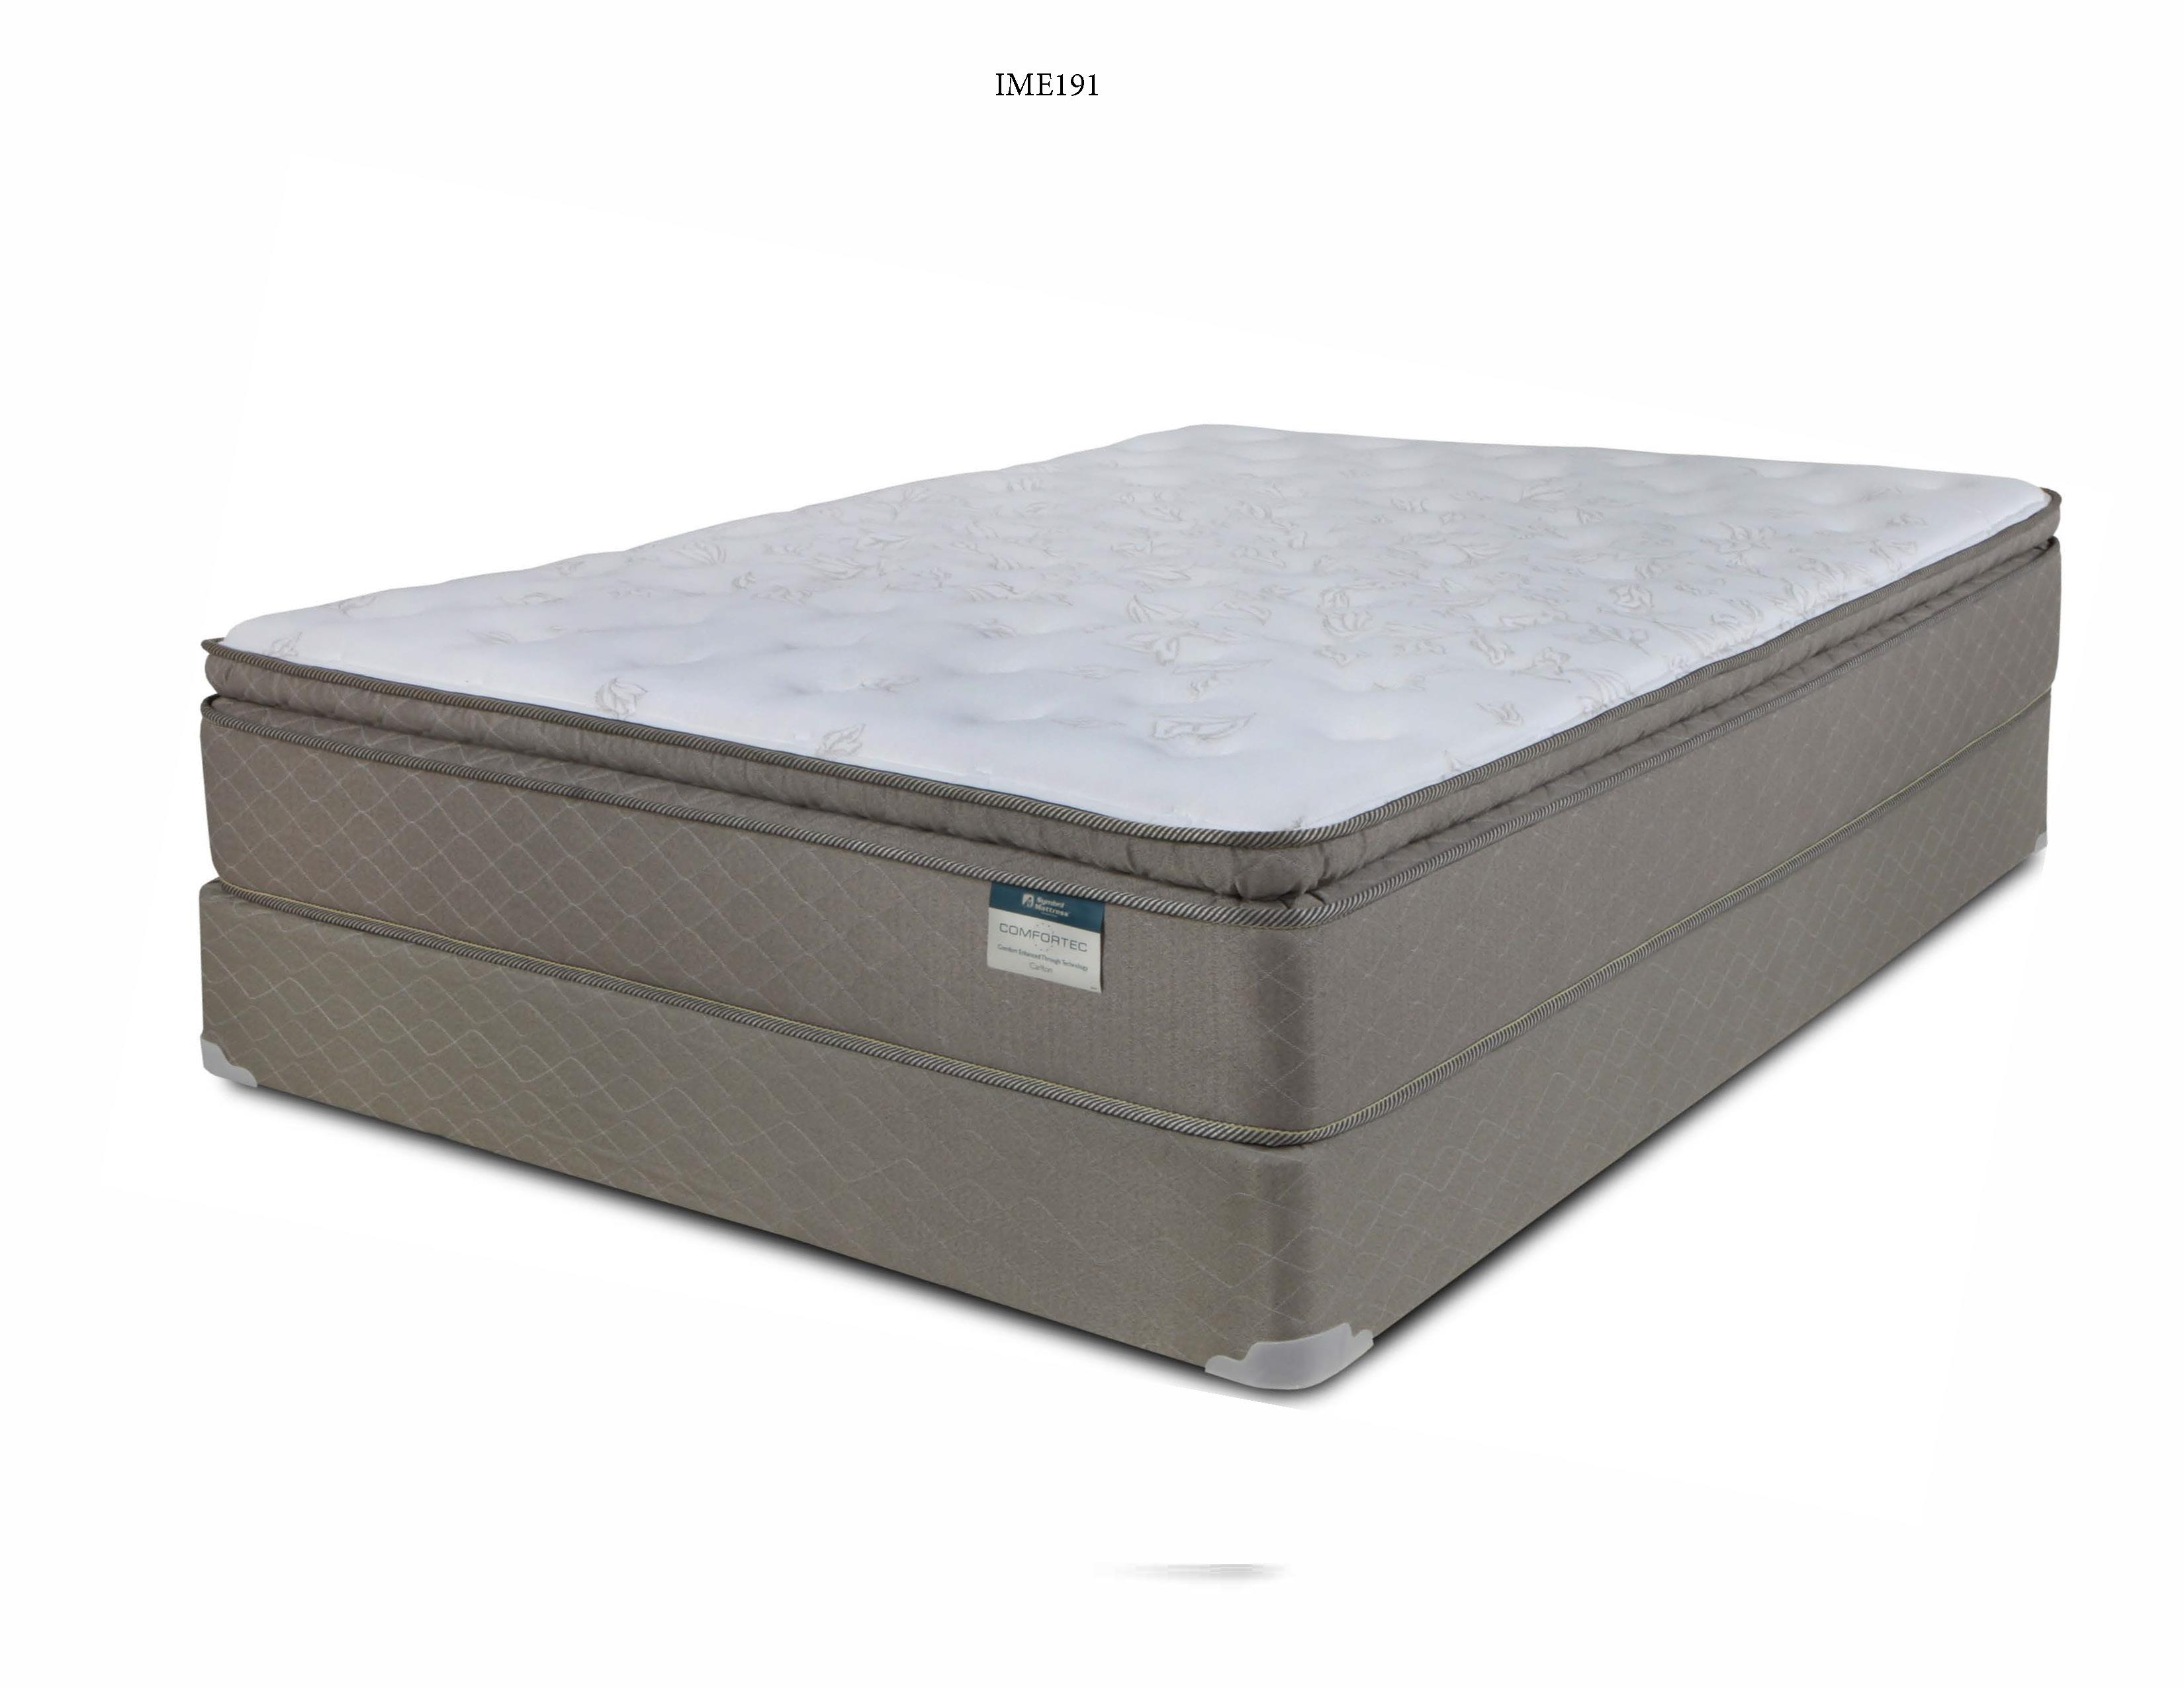 A1 Better Rest Catskill Twin Extra Long Pillow Top